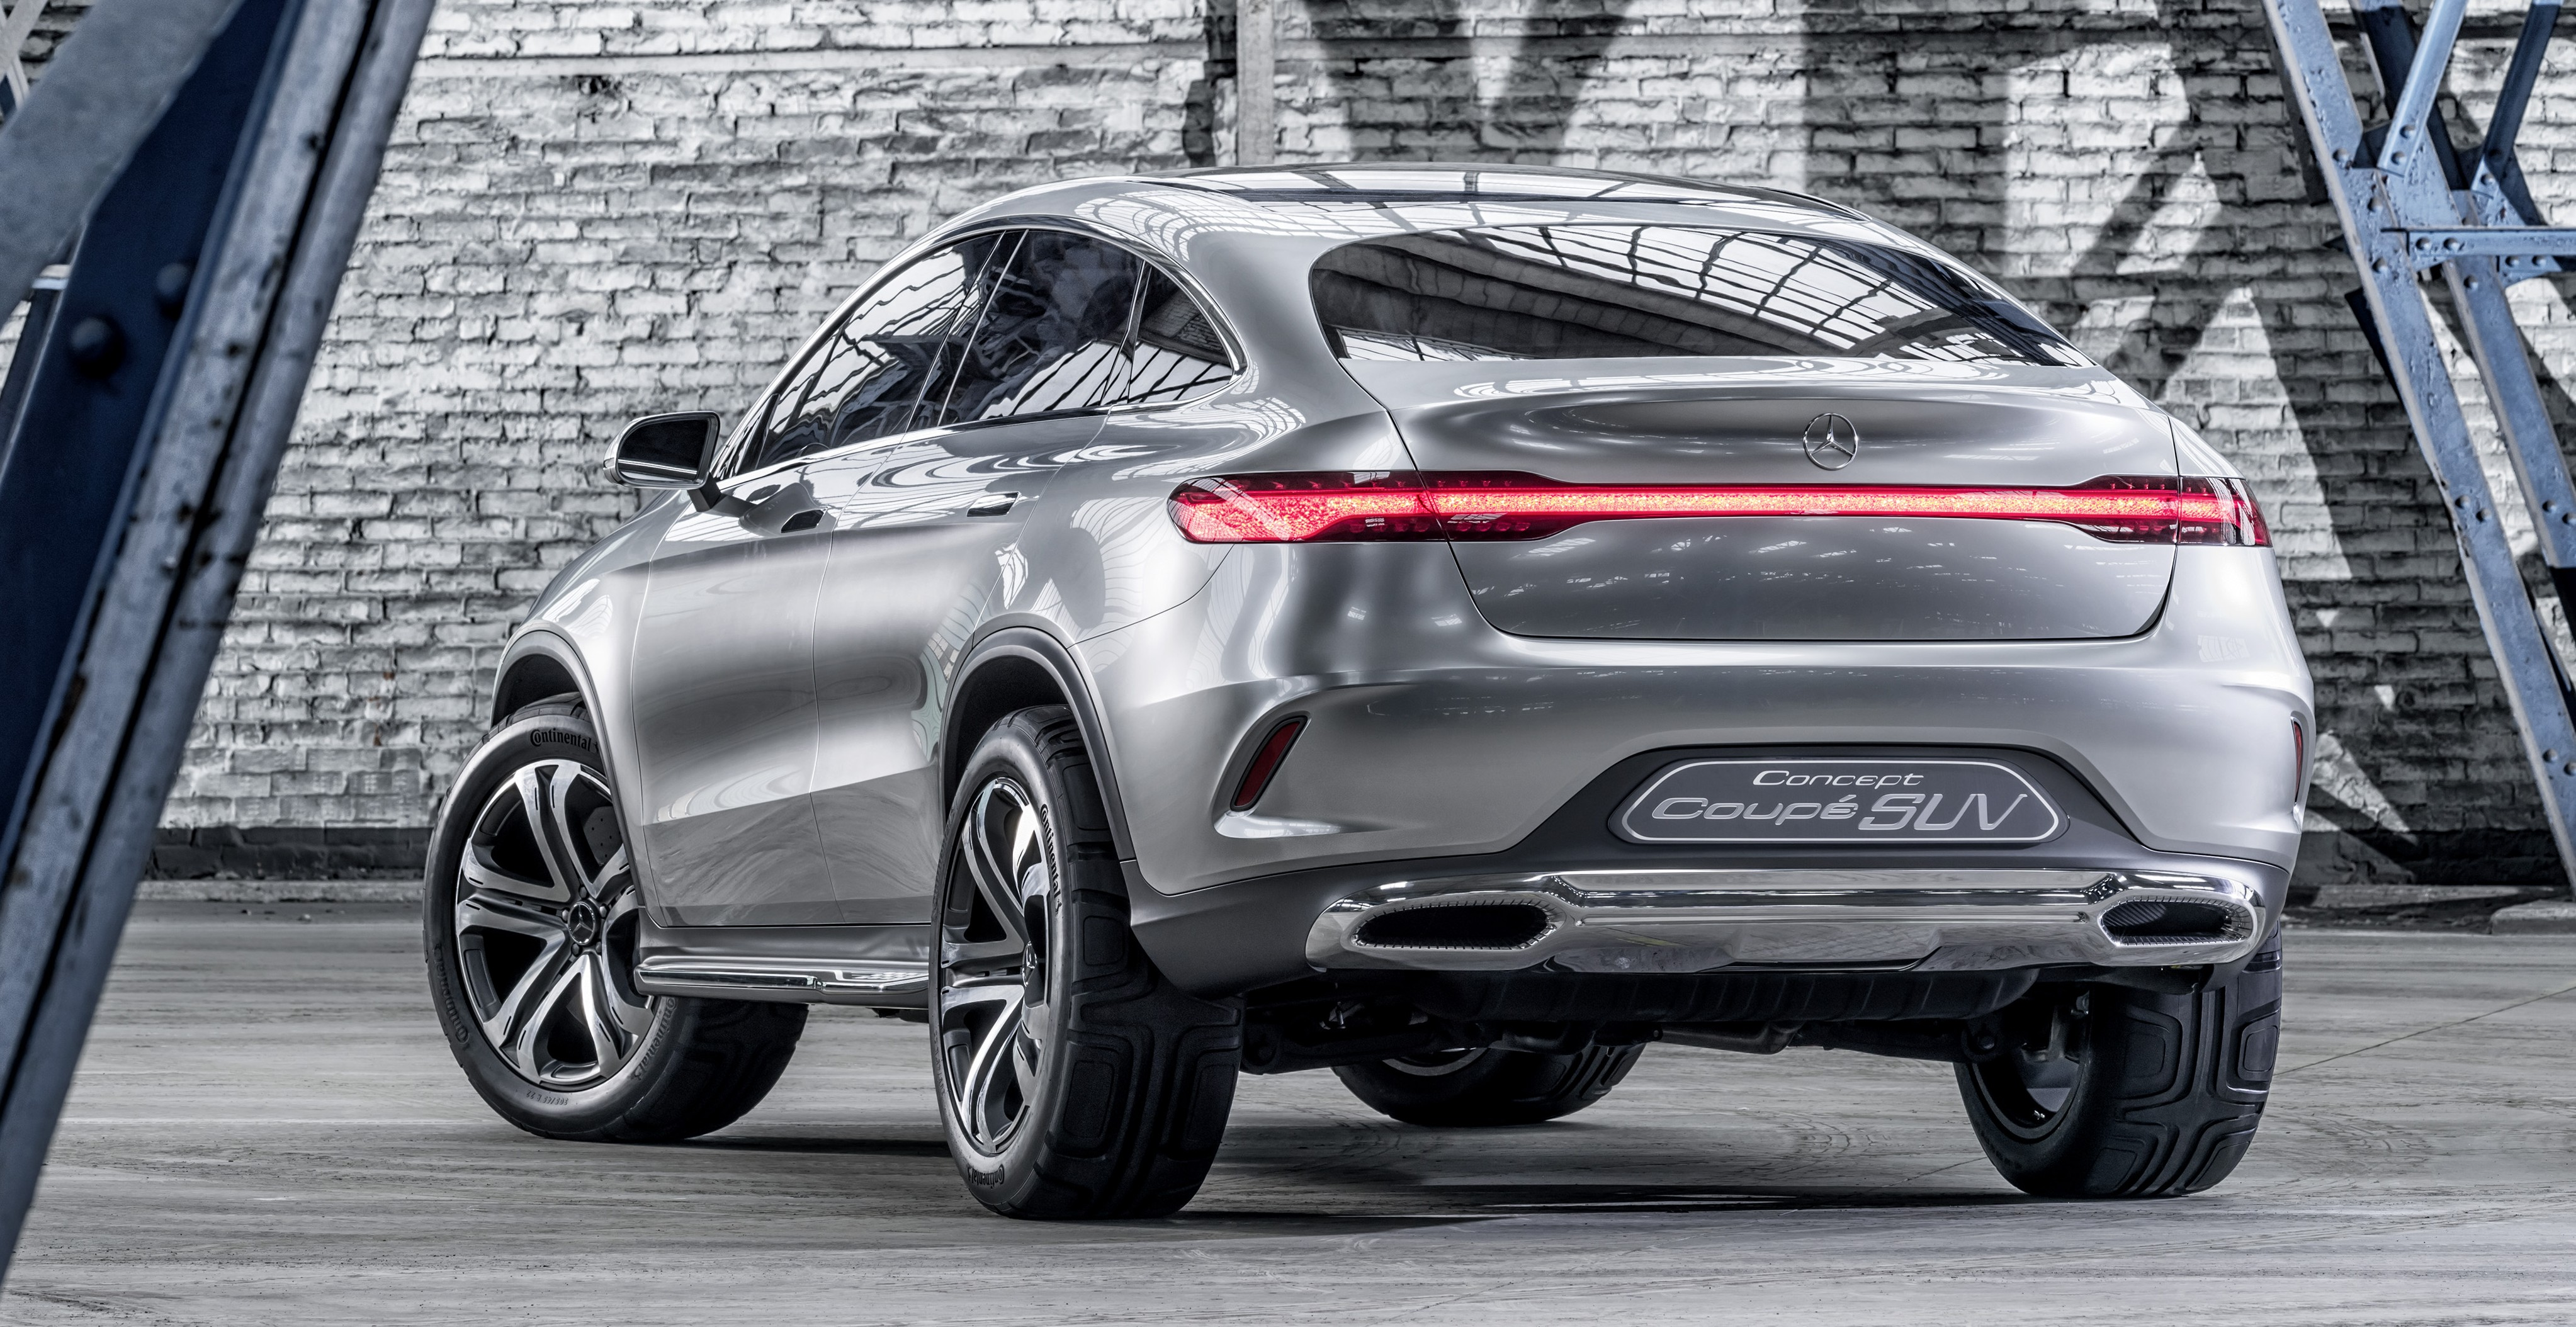 Mercedes Benz Coupe Suv Concept Previews X6 Rival Image 242561